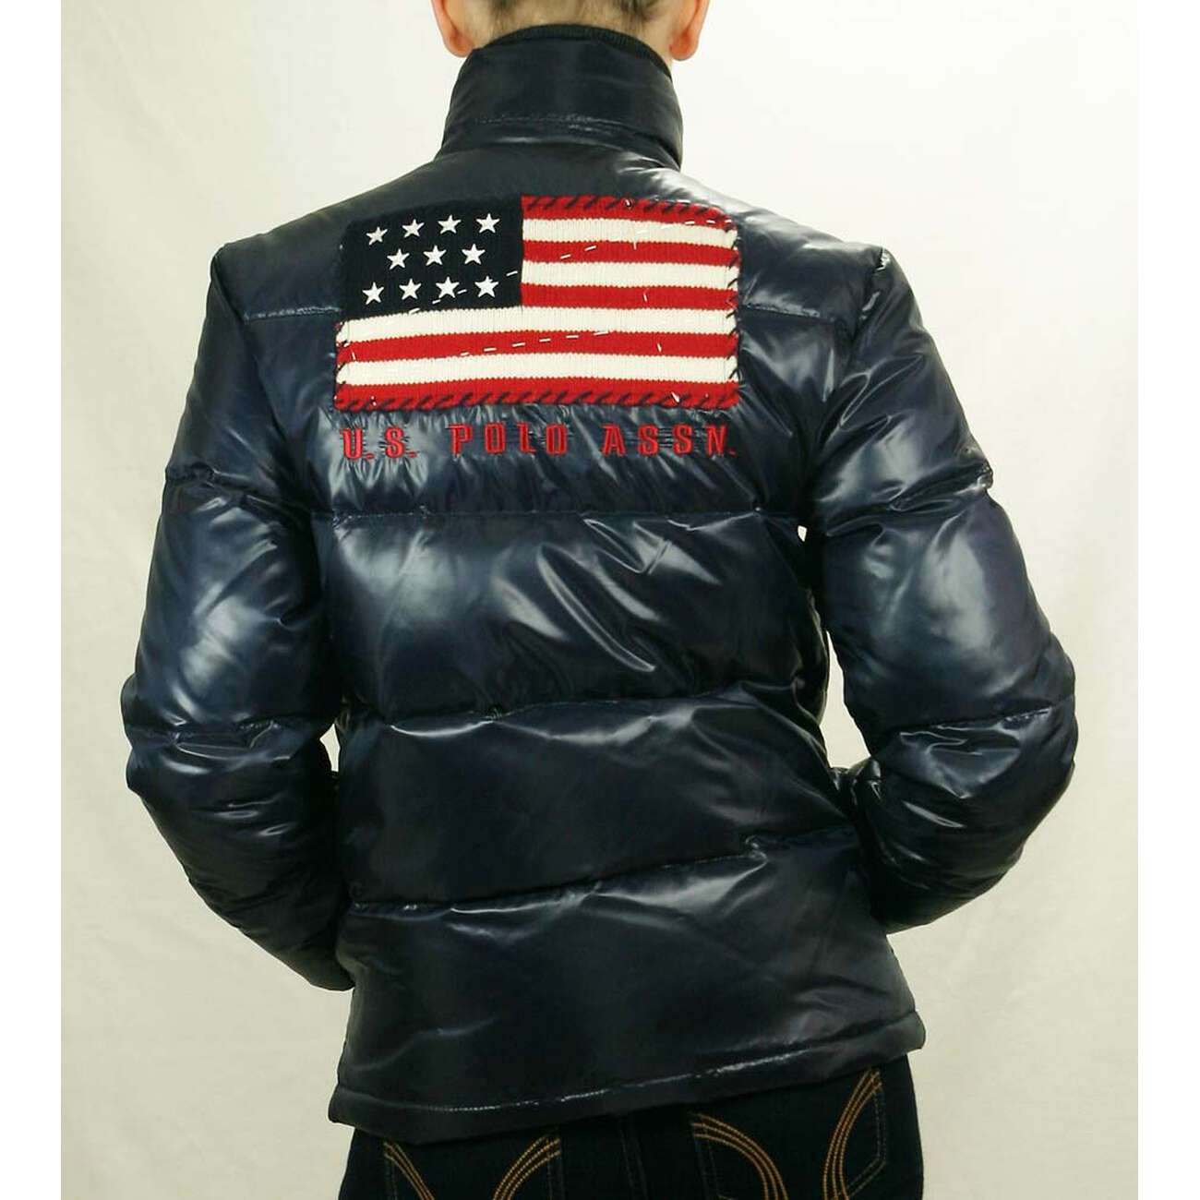 60b06fab1c5 ... US Polo ASSN USA Flagge WinterJacke Jacke Daunenjacke Jacke Steppjacke  ...